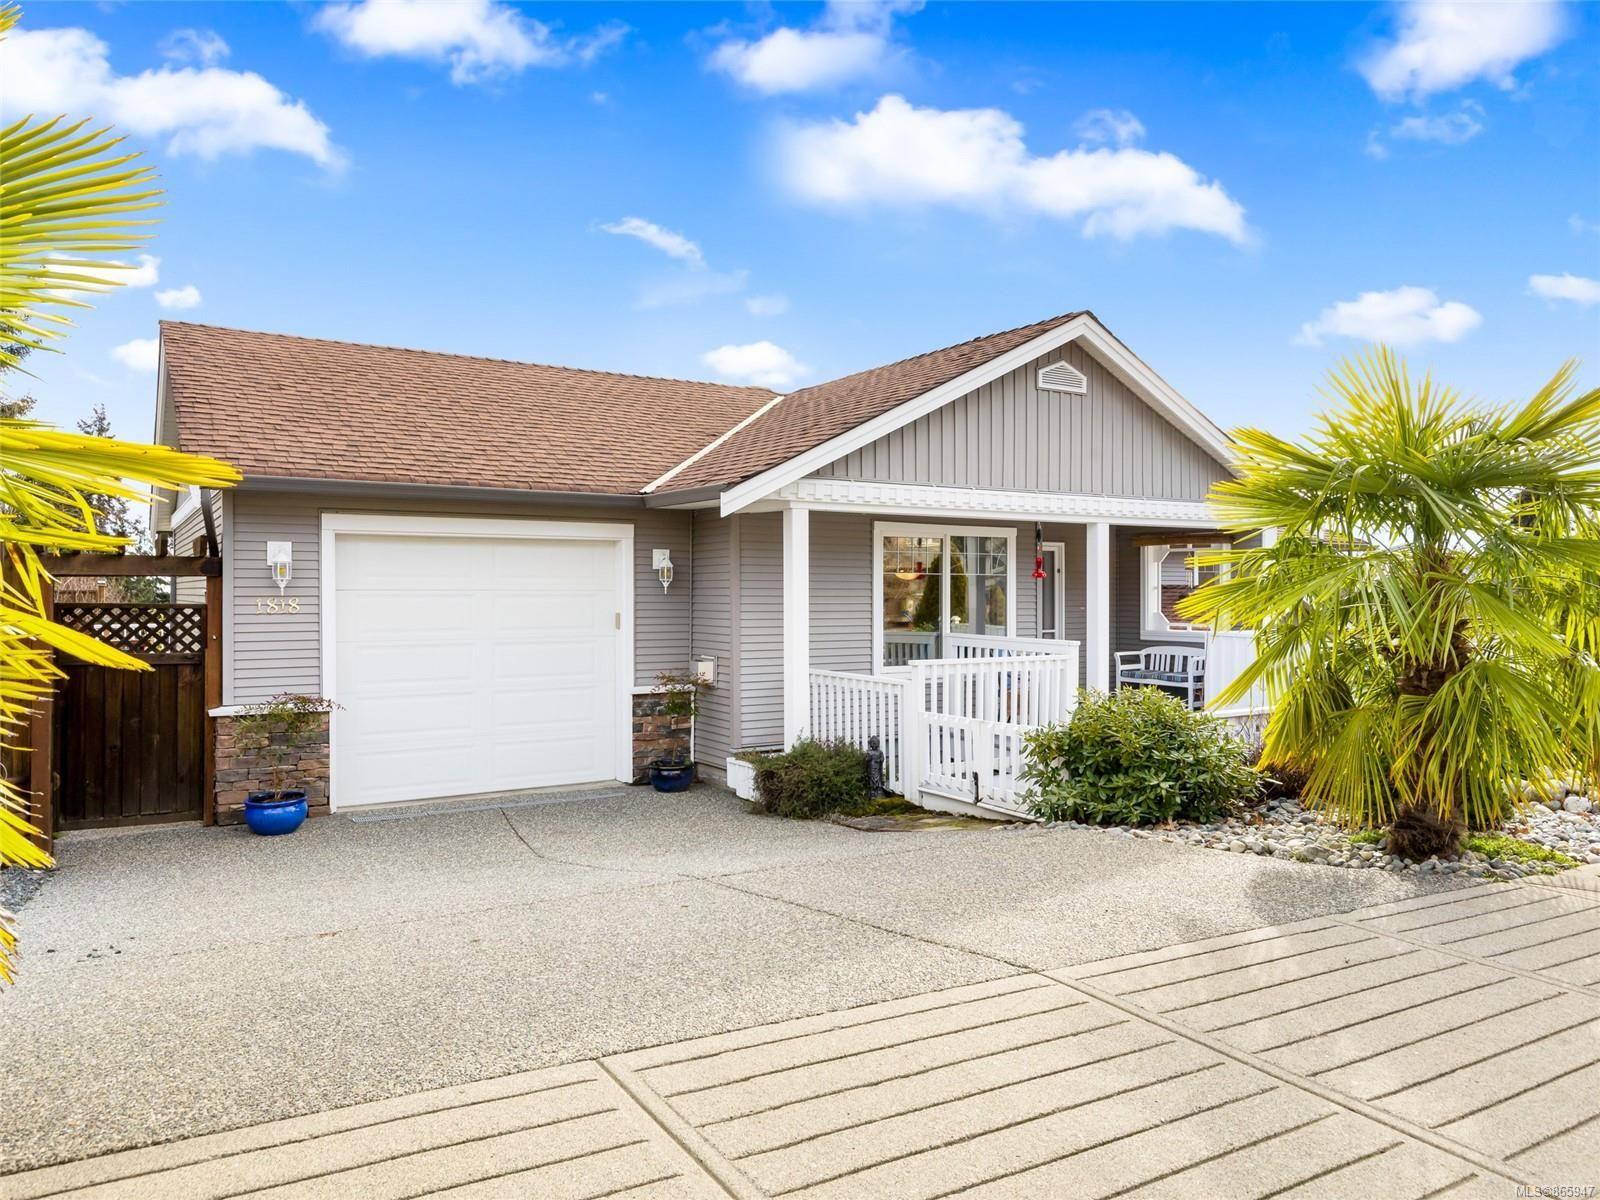 Main Photo: 1818 White Blossom Way in : Na Chase River Half Duplex for sale (Nanaimo)  : MLS®# 865947